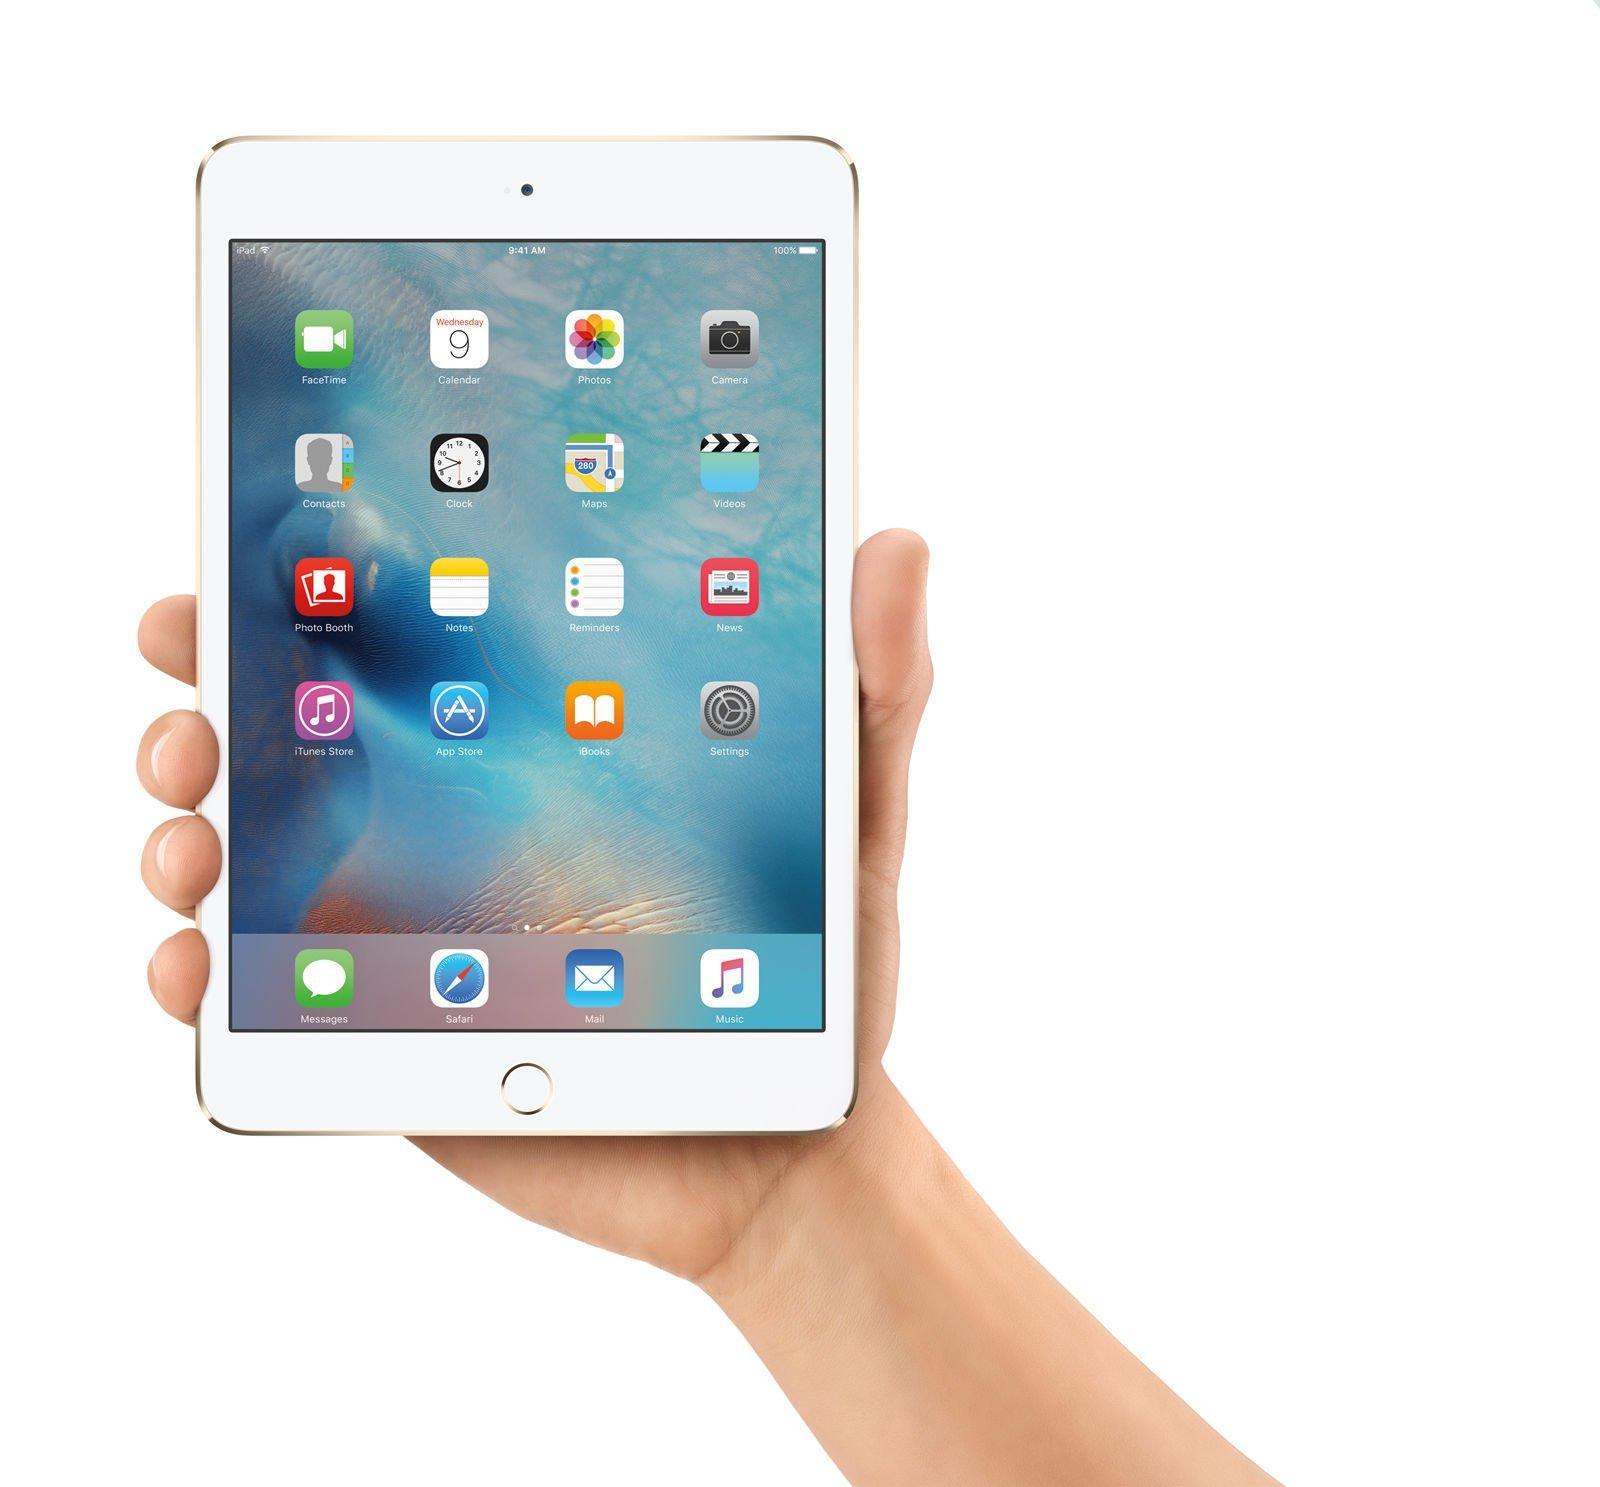 Планшет Apple iPad Мини: комплектация, аксессуары